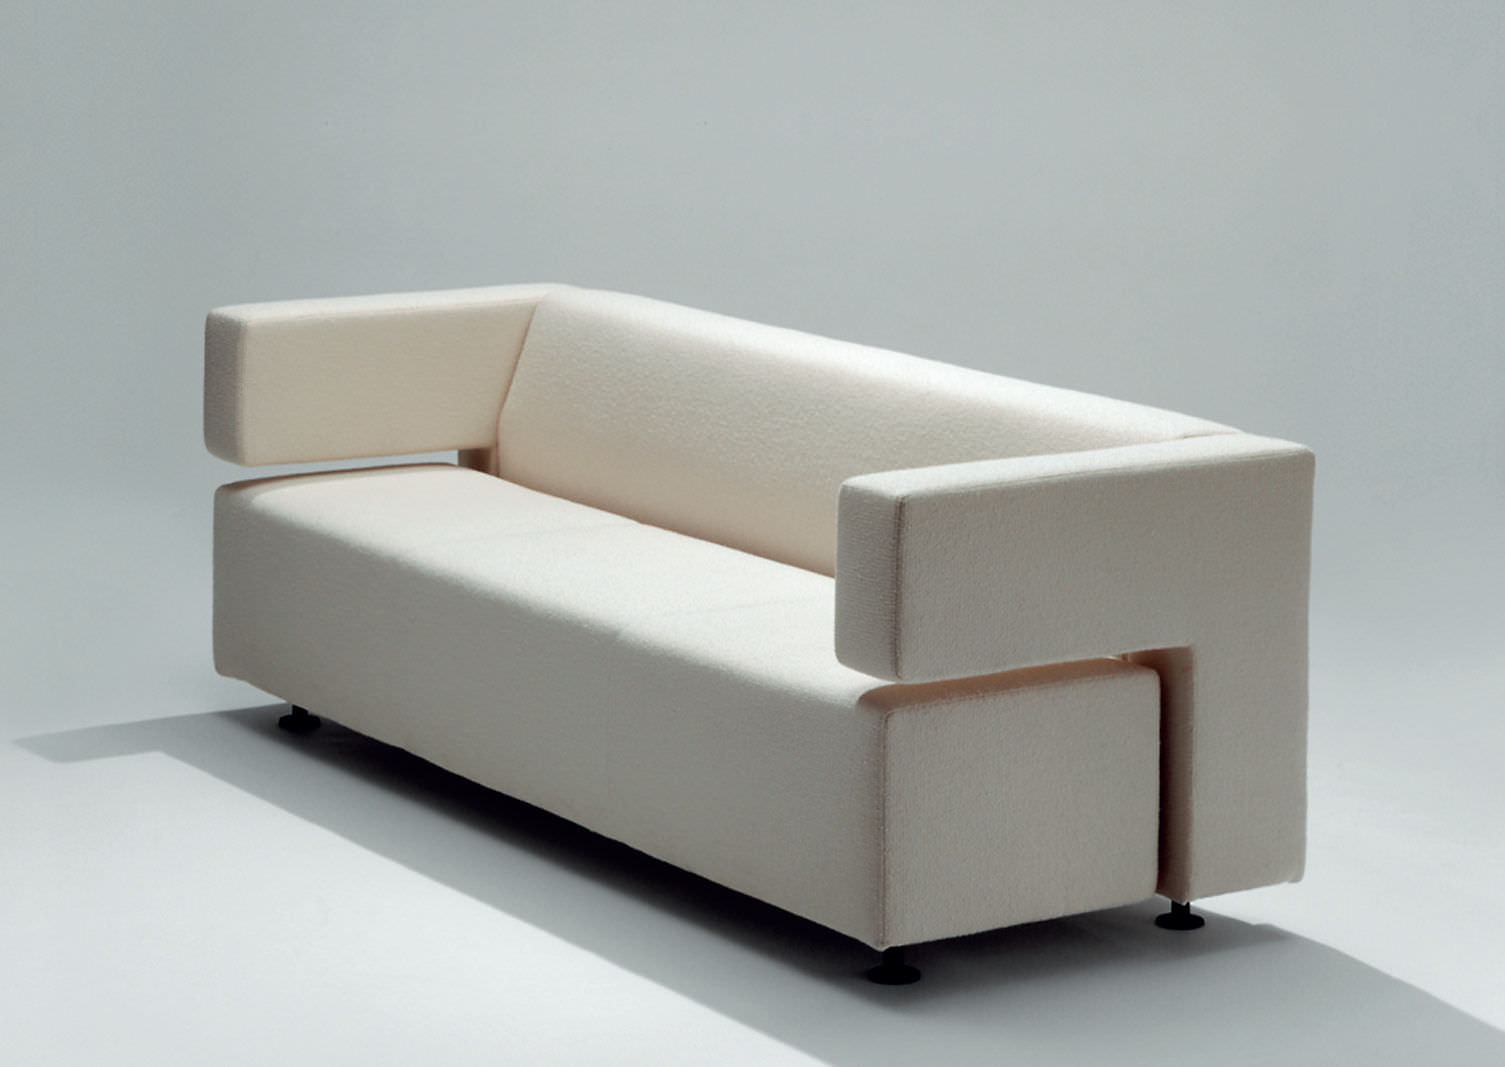 Contemporary Sofa / Leather / Fabric / 2 Person – Milojouko Pertaining To Milo Sofa Chairs (Image 5 of 25)